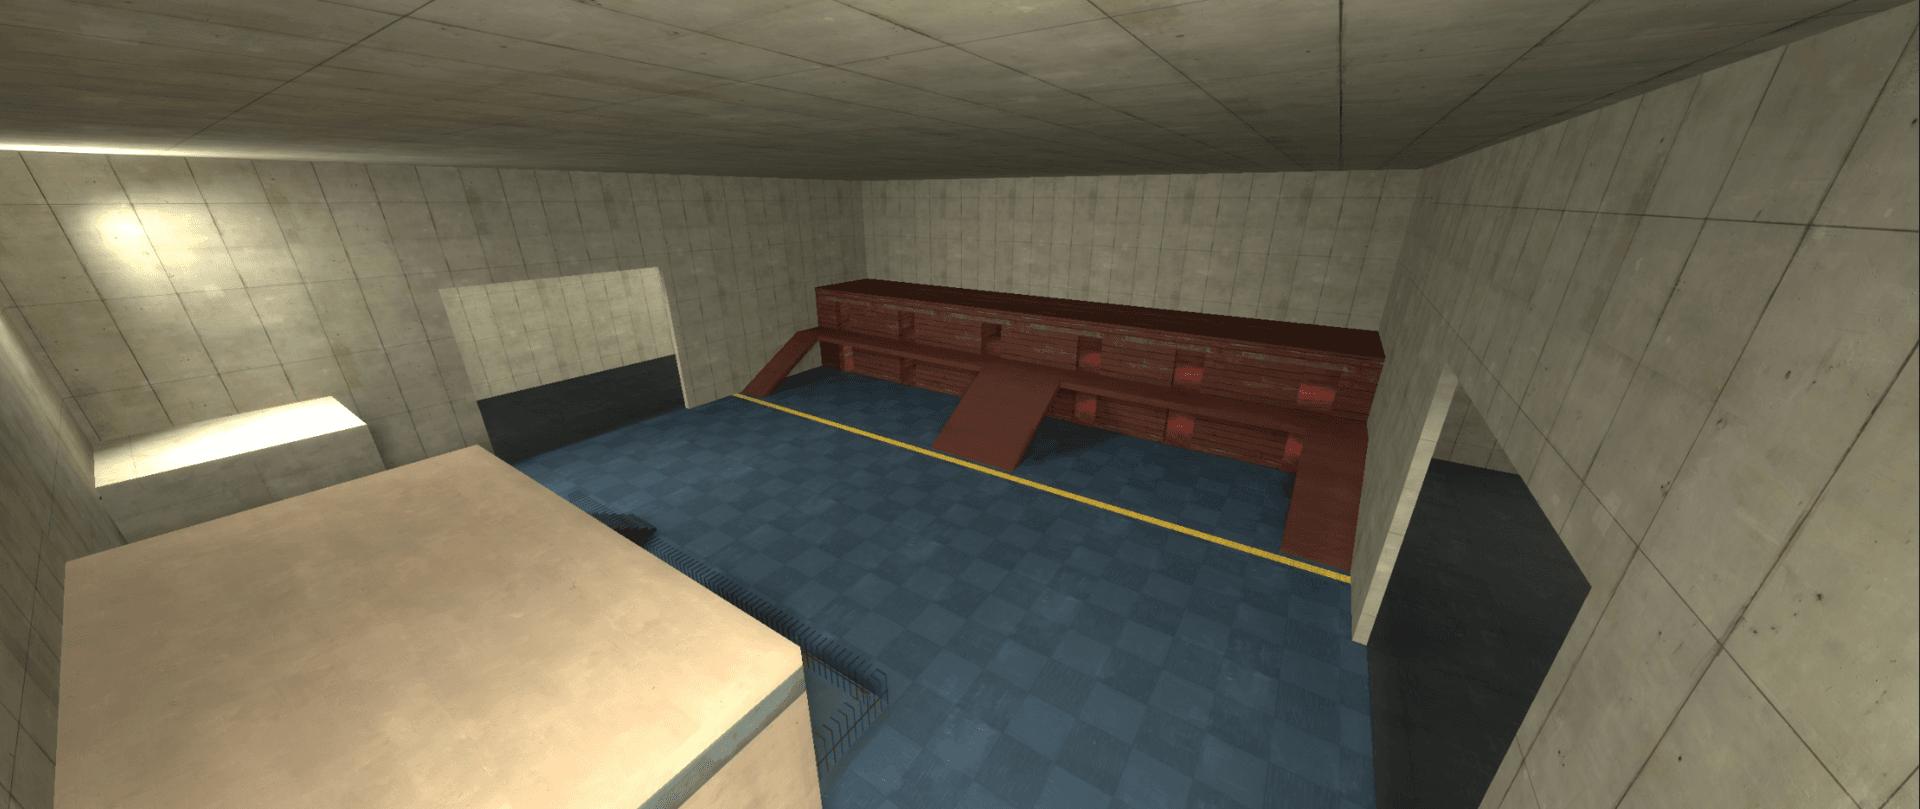 JailbreakMap2.PNG